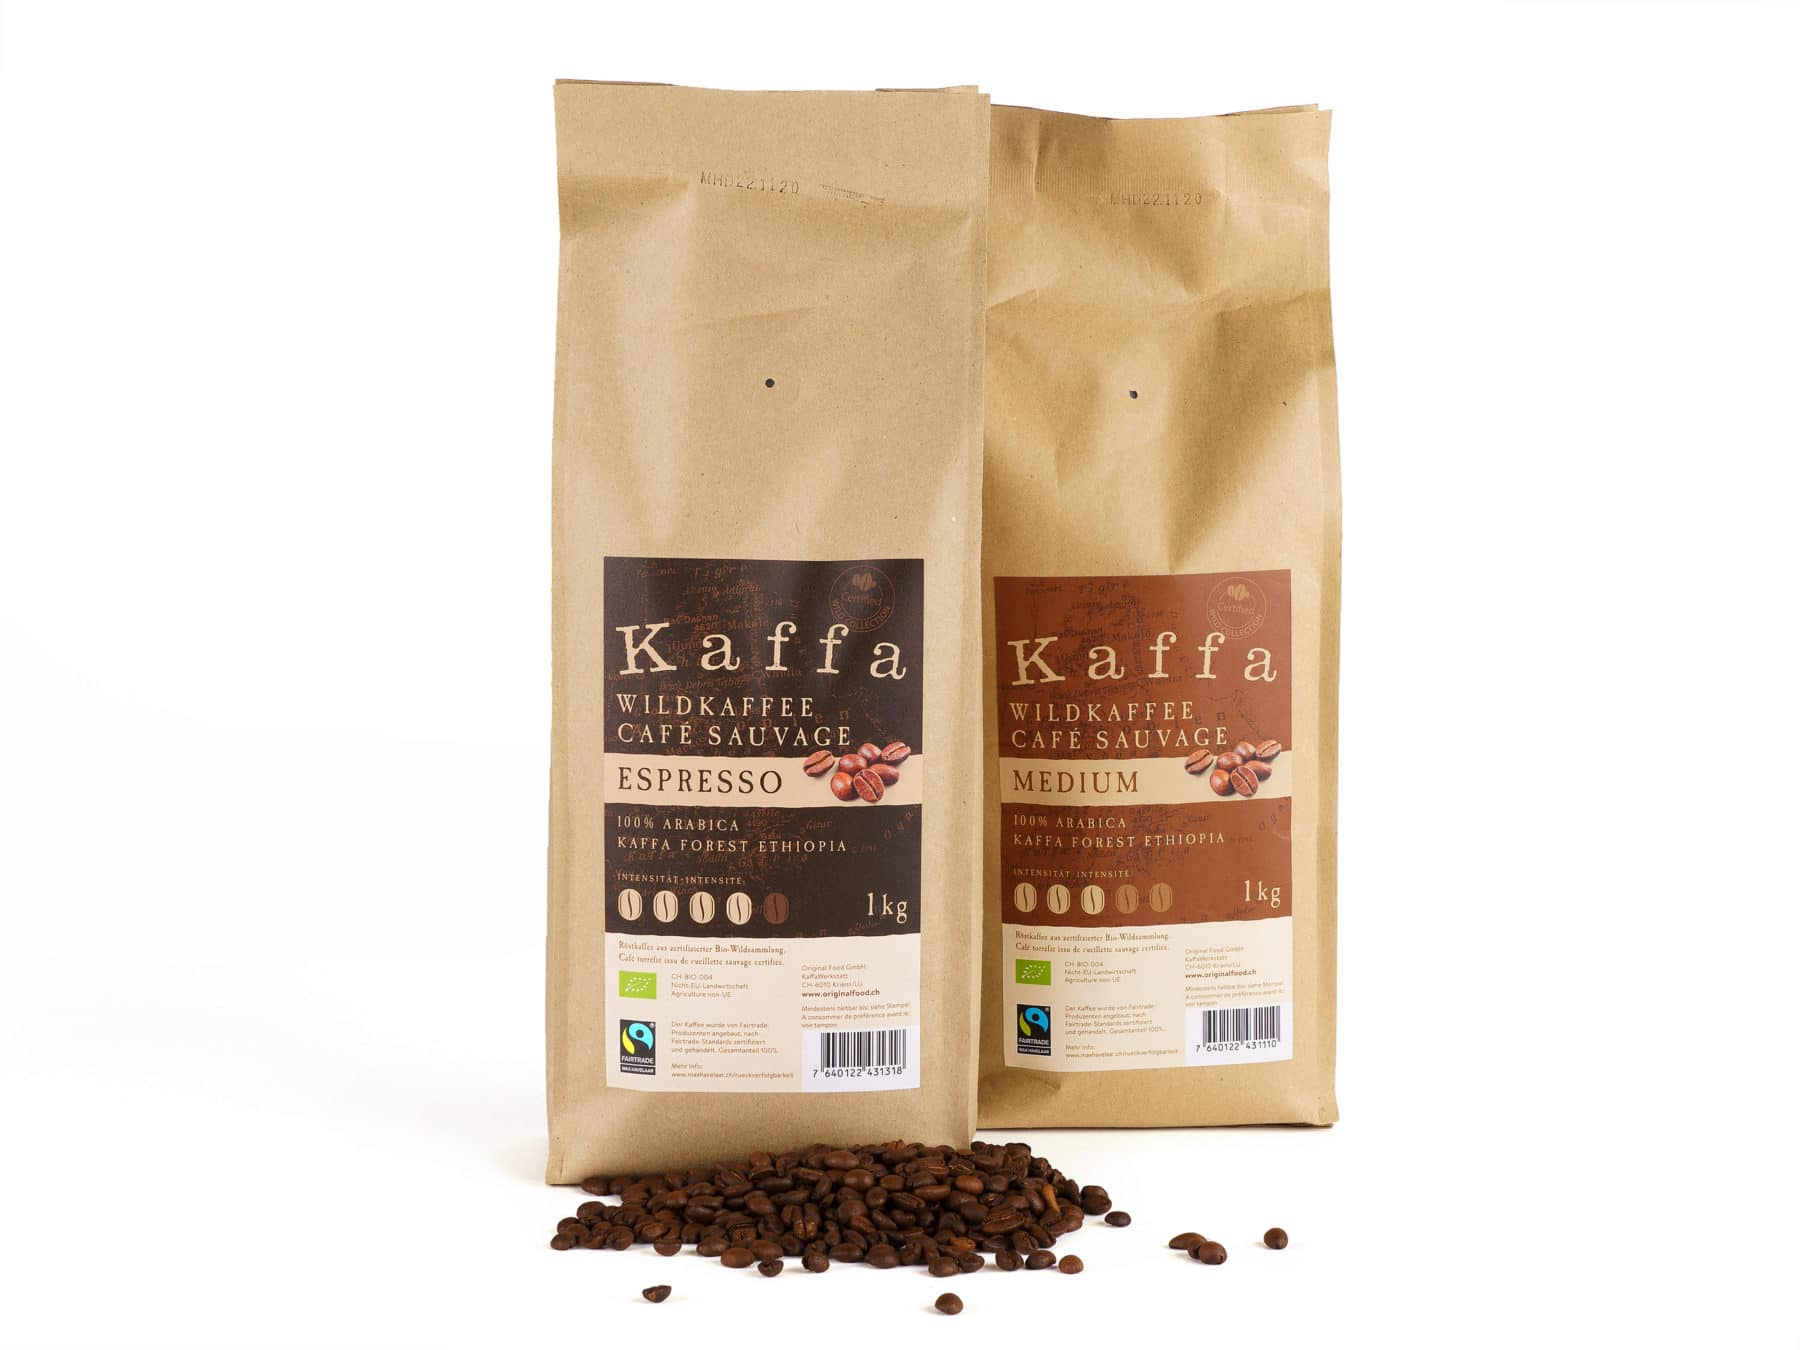 Kaffa Wildkaffee Original Food Bio KURTS